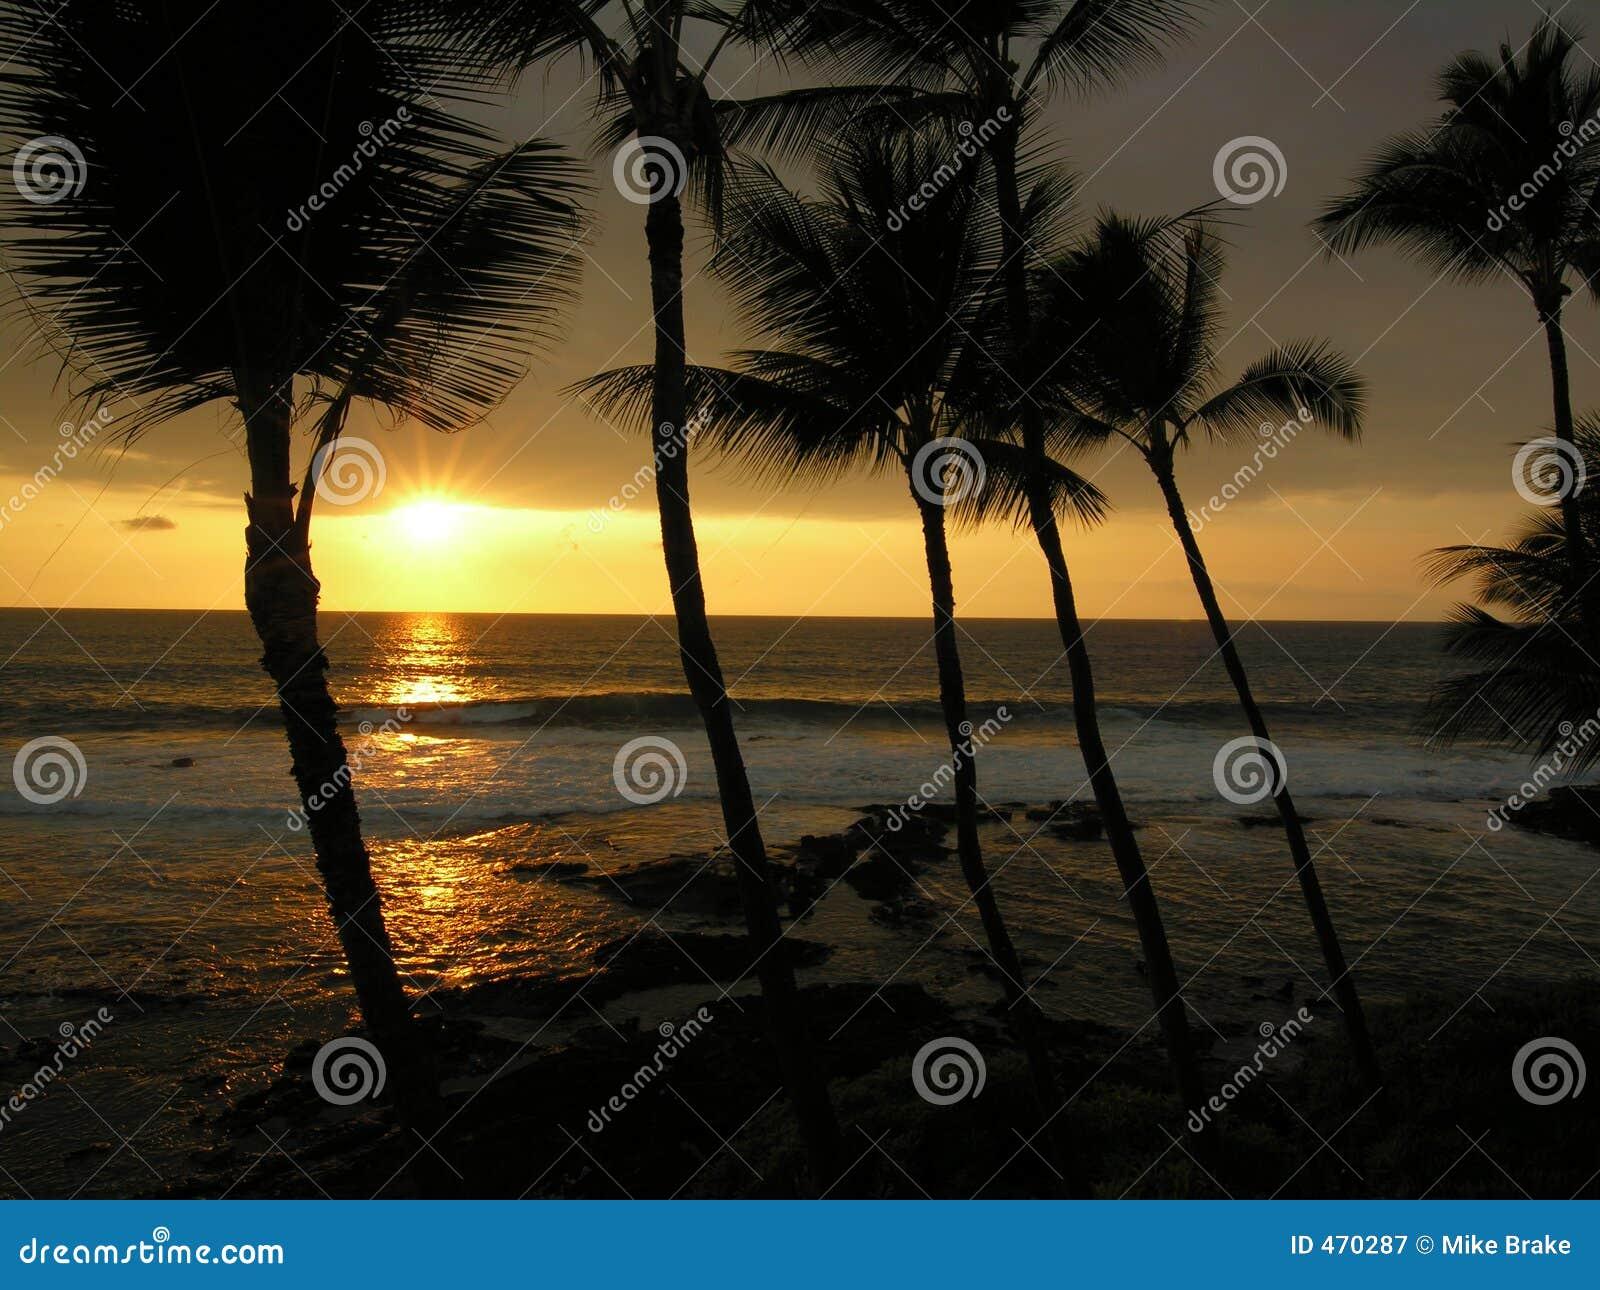 Download Big Island Sunset stock image. Image of beach, seas, coastline - 470287